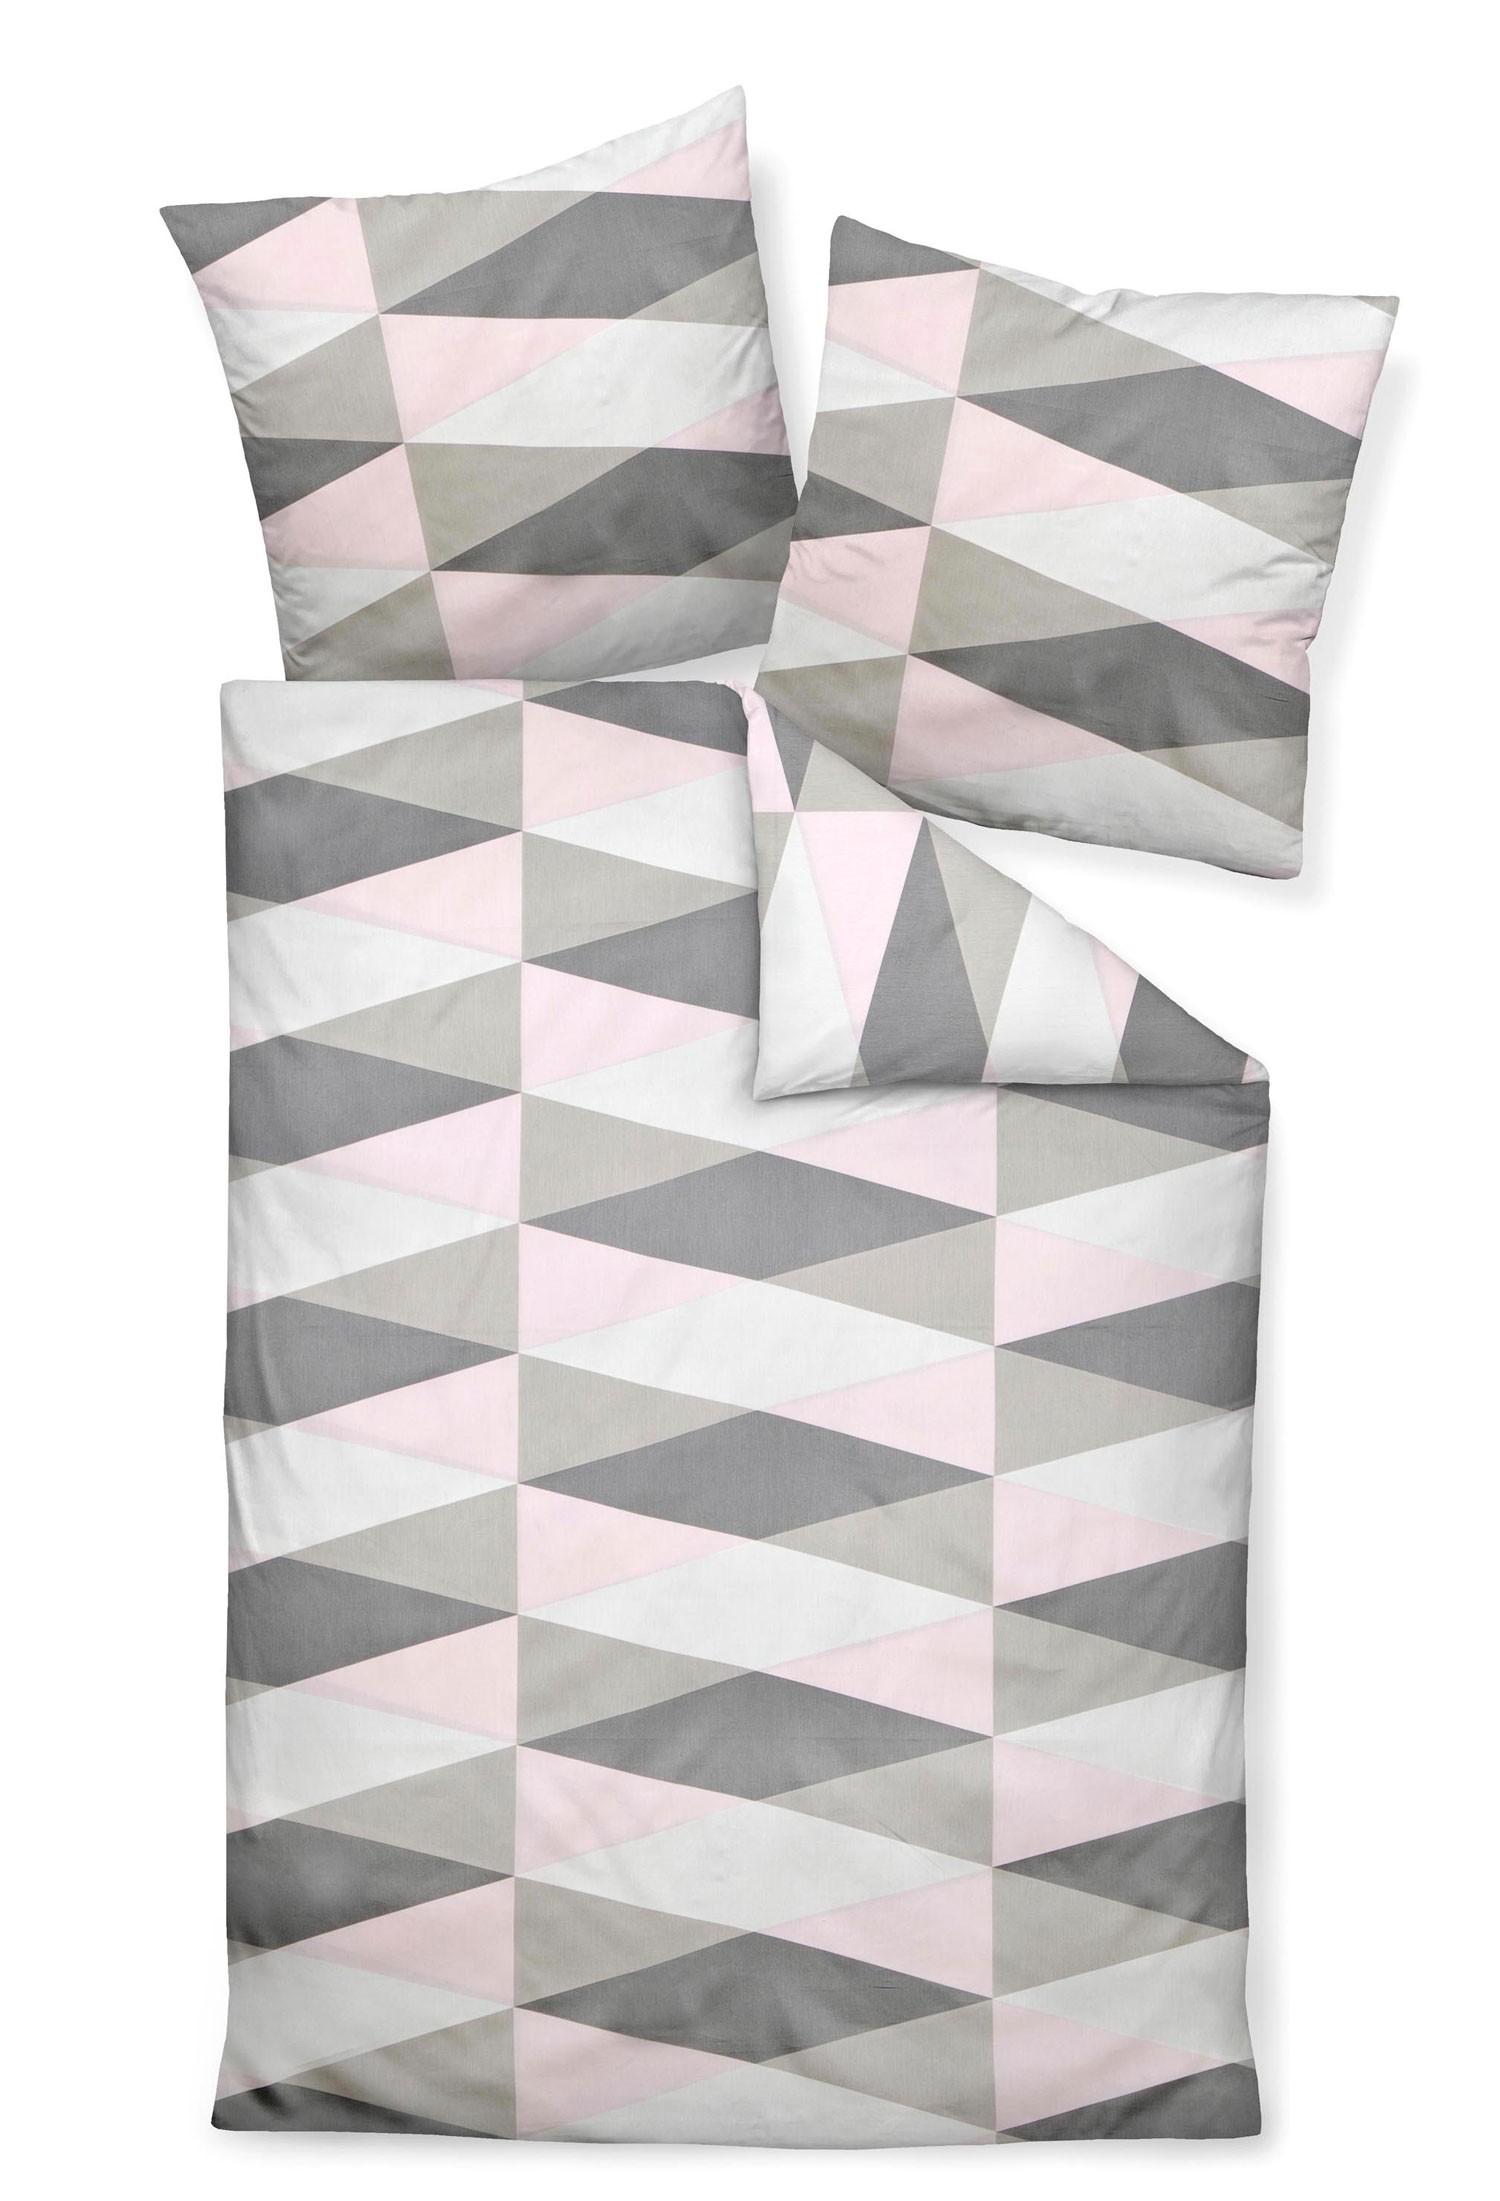 bettw sche janine j d 87014 rosa grau. Black Bedroom Furniture Sets. Home Design Ideas